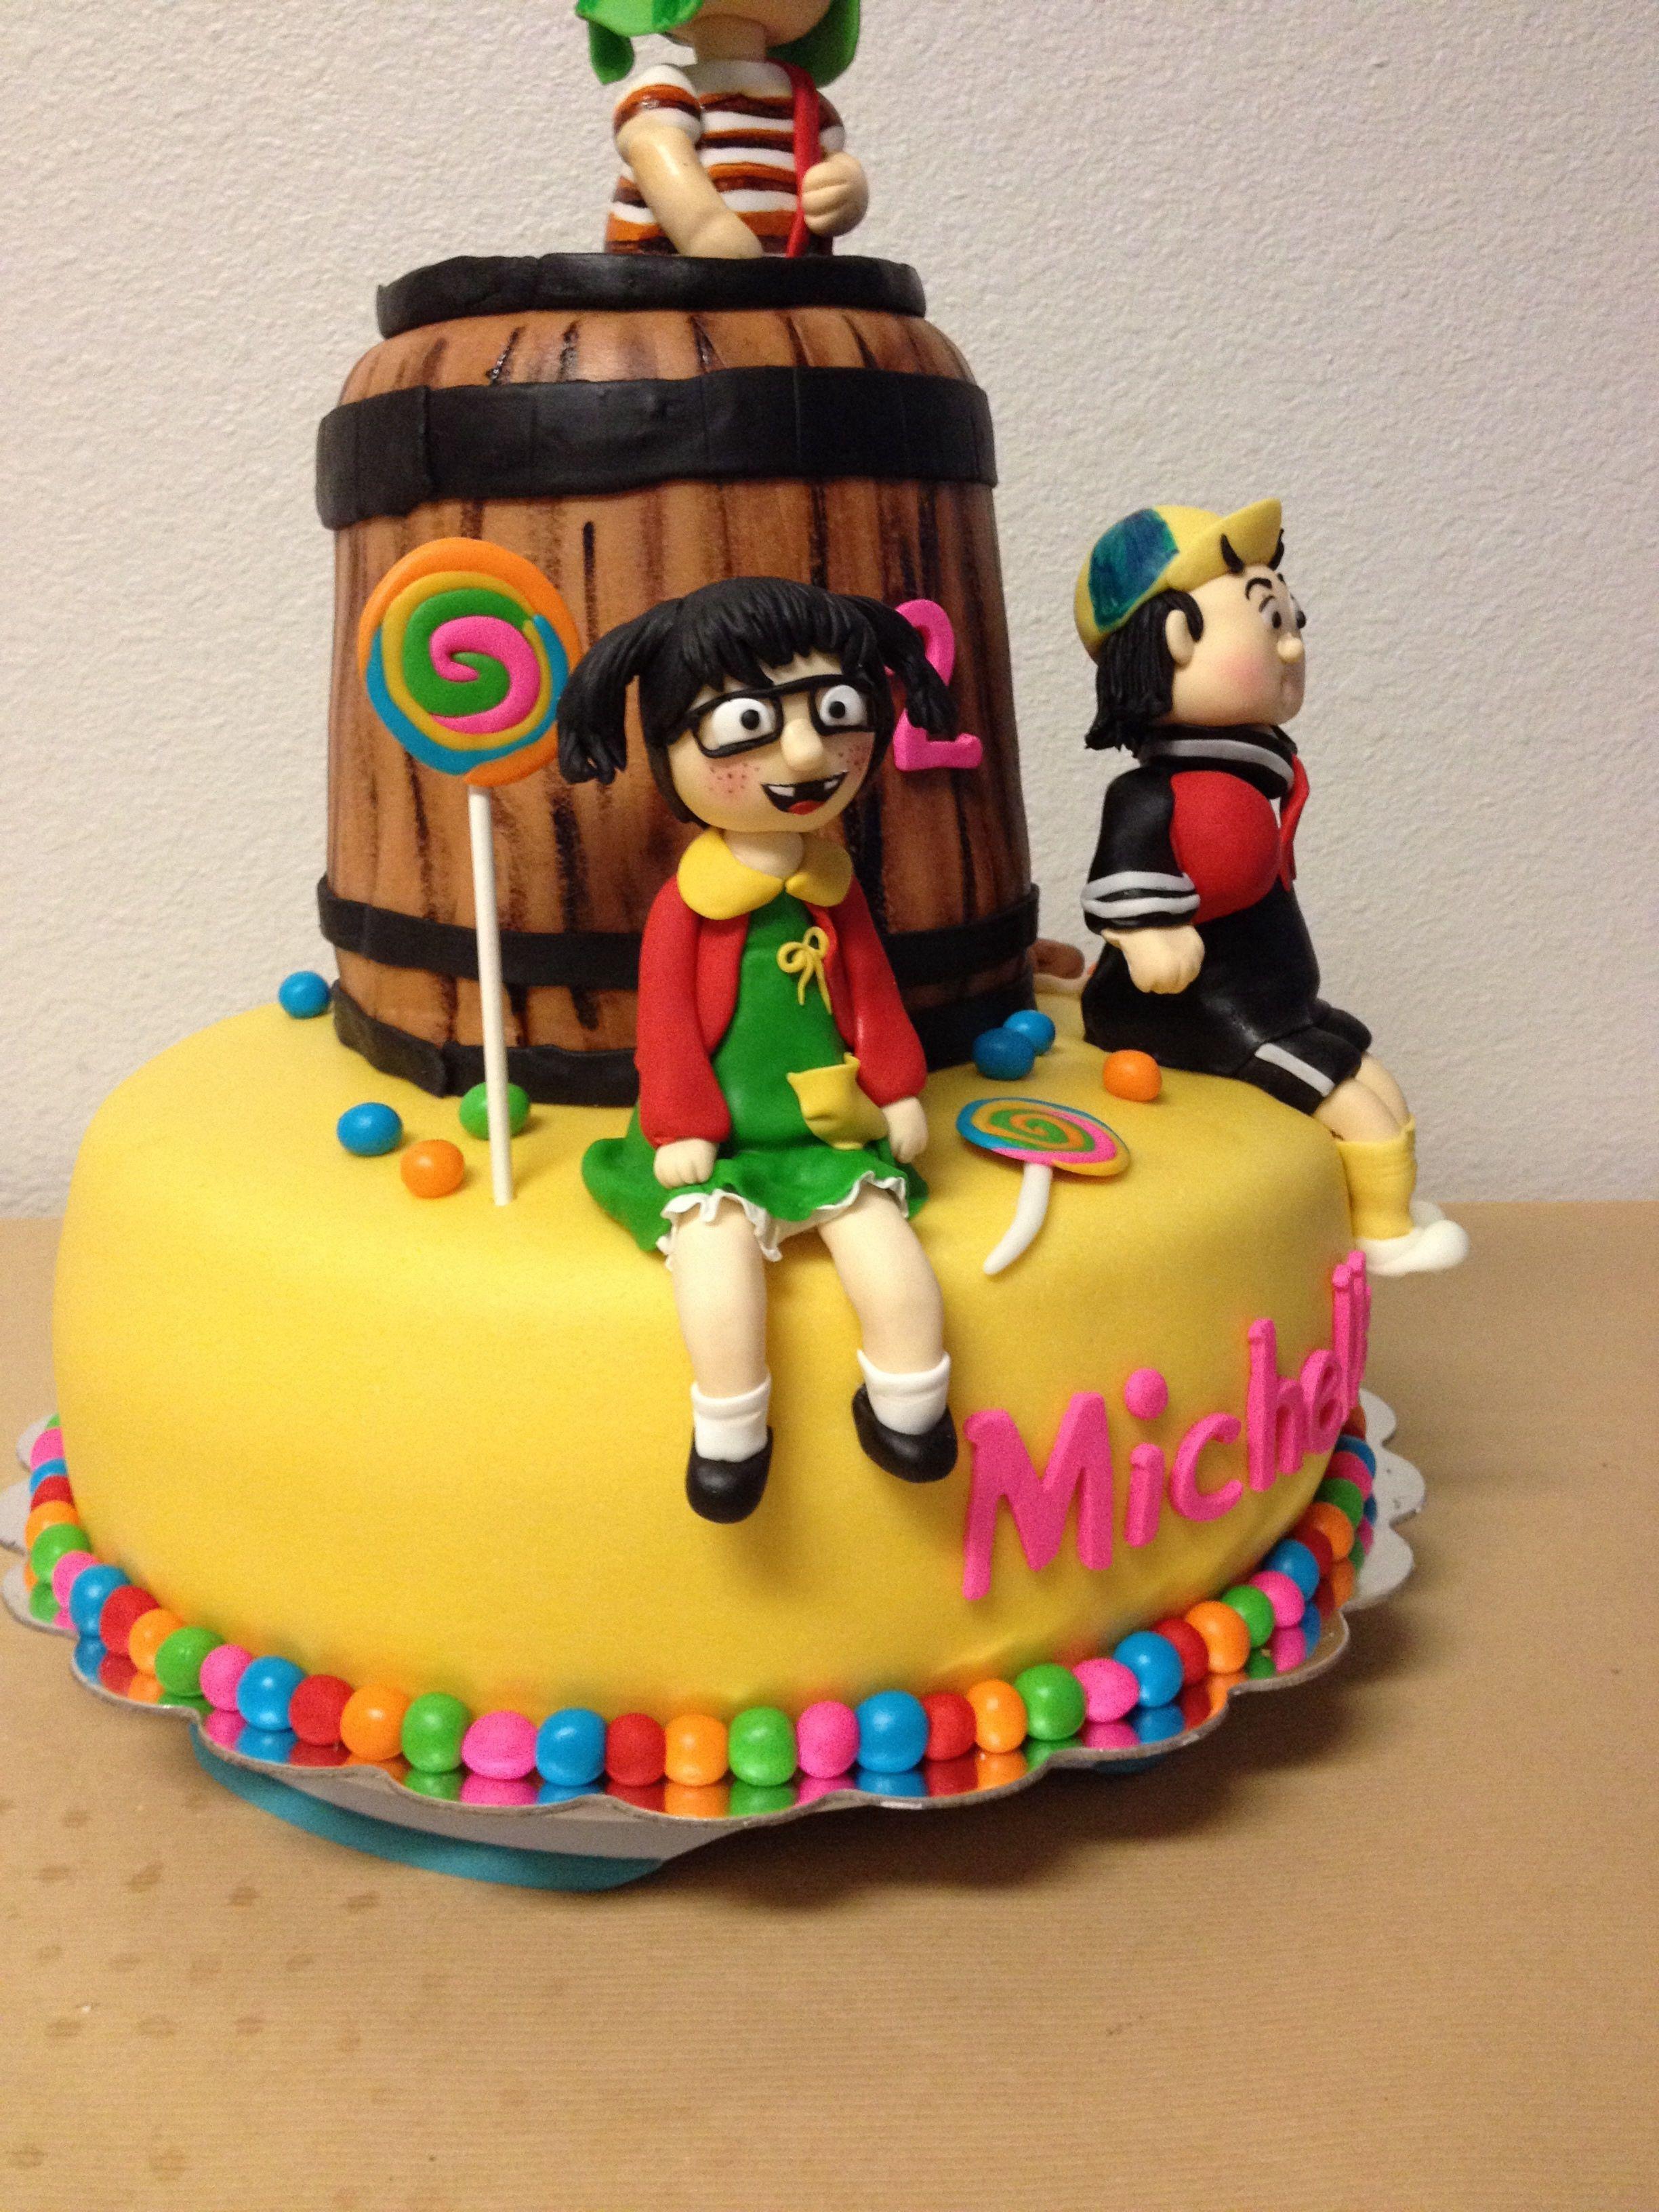 El Chavo Del 8 Birthday Cake Cakecentral Com